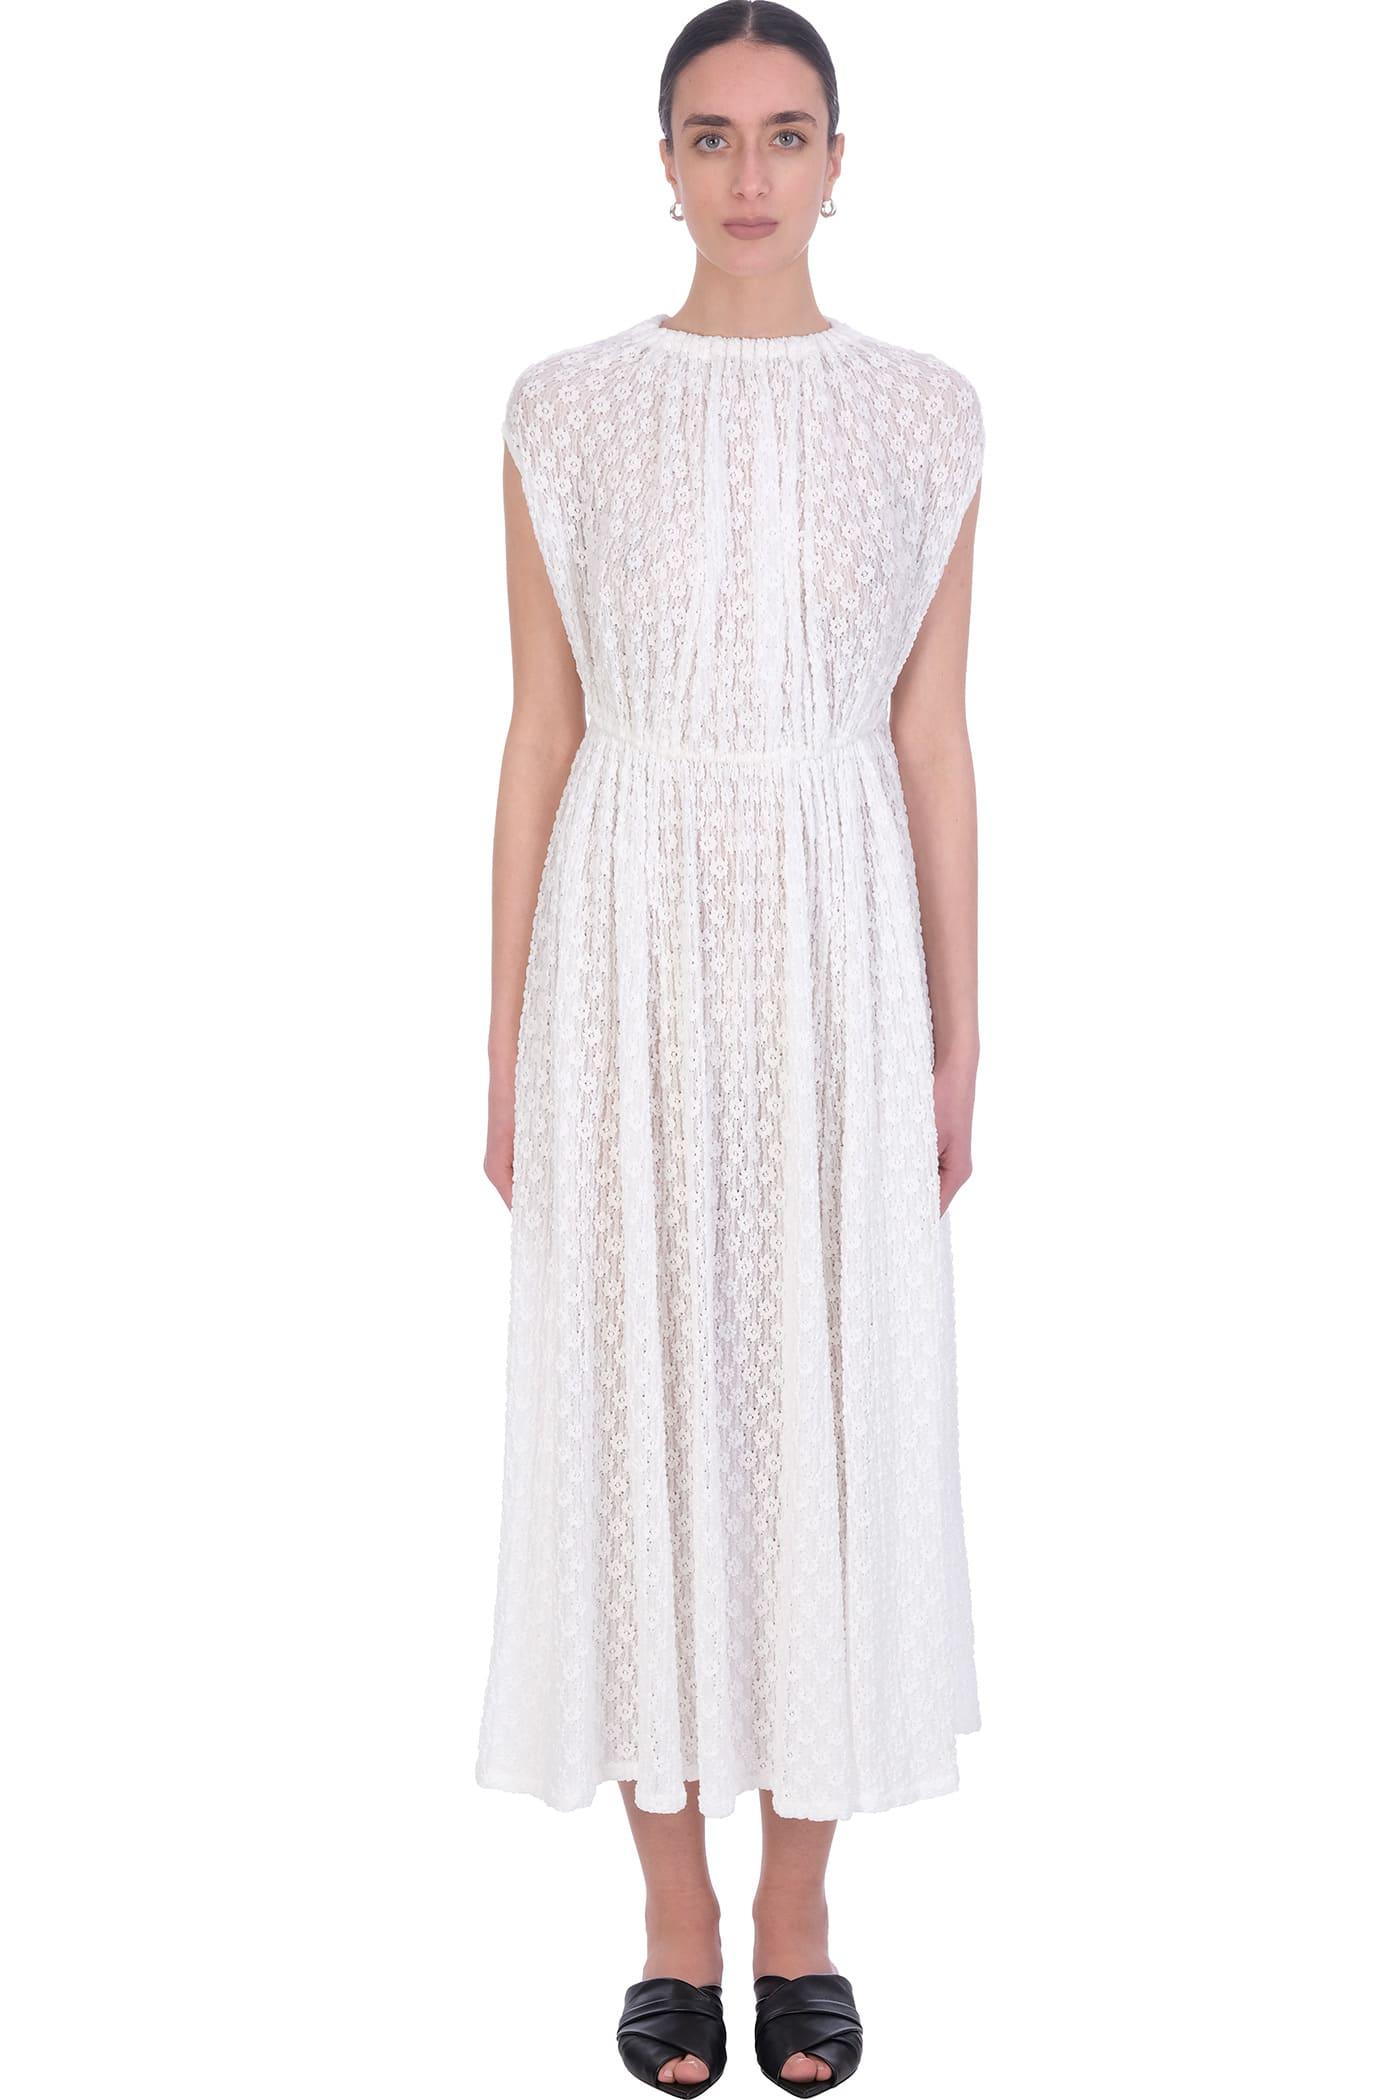 Jil Sander Cottons DRESS IN WHITE POLYAMIDE